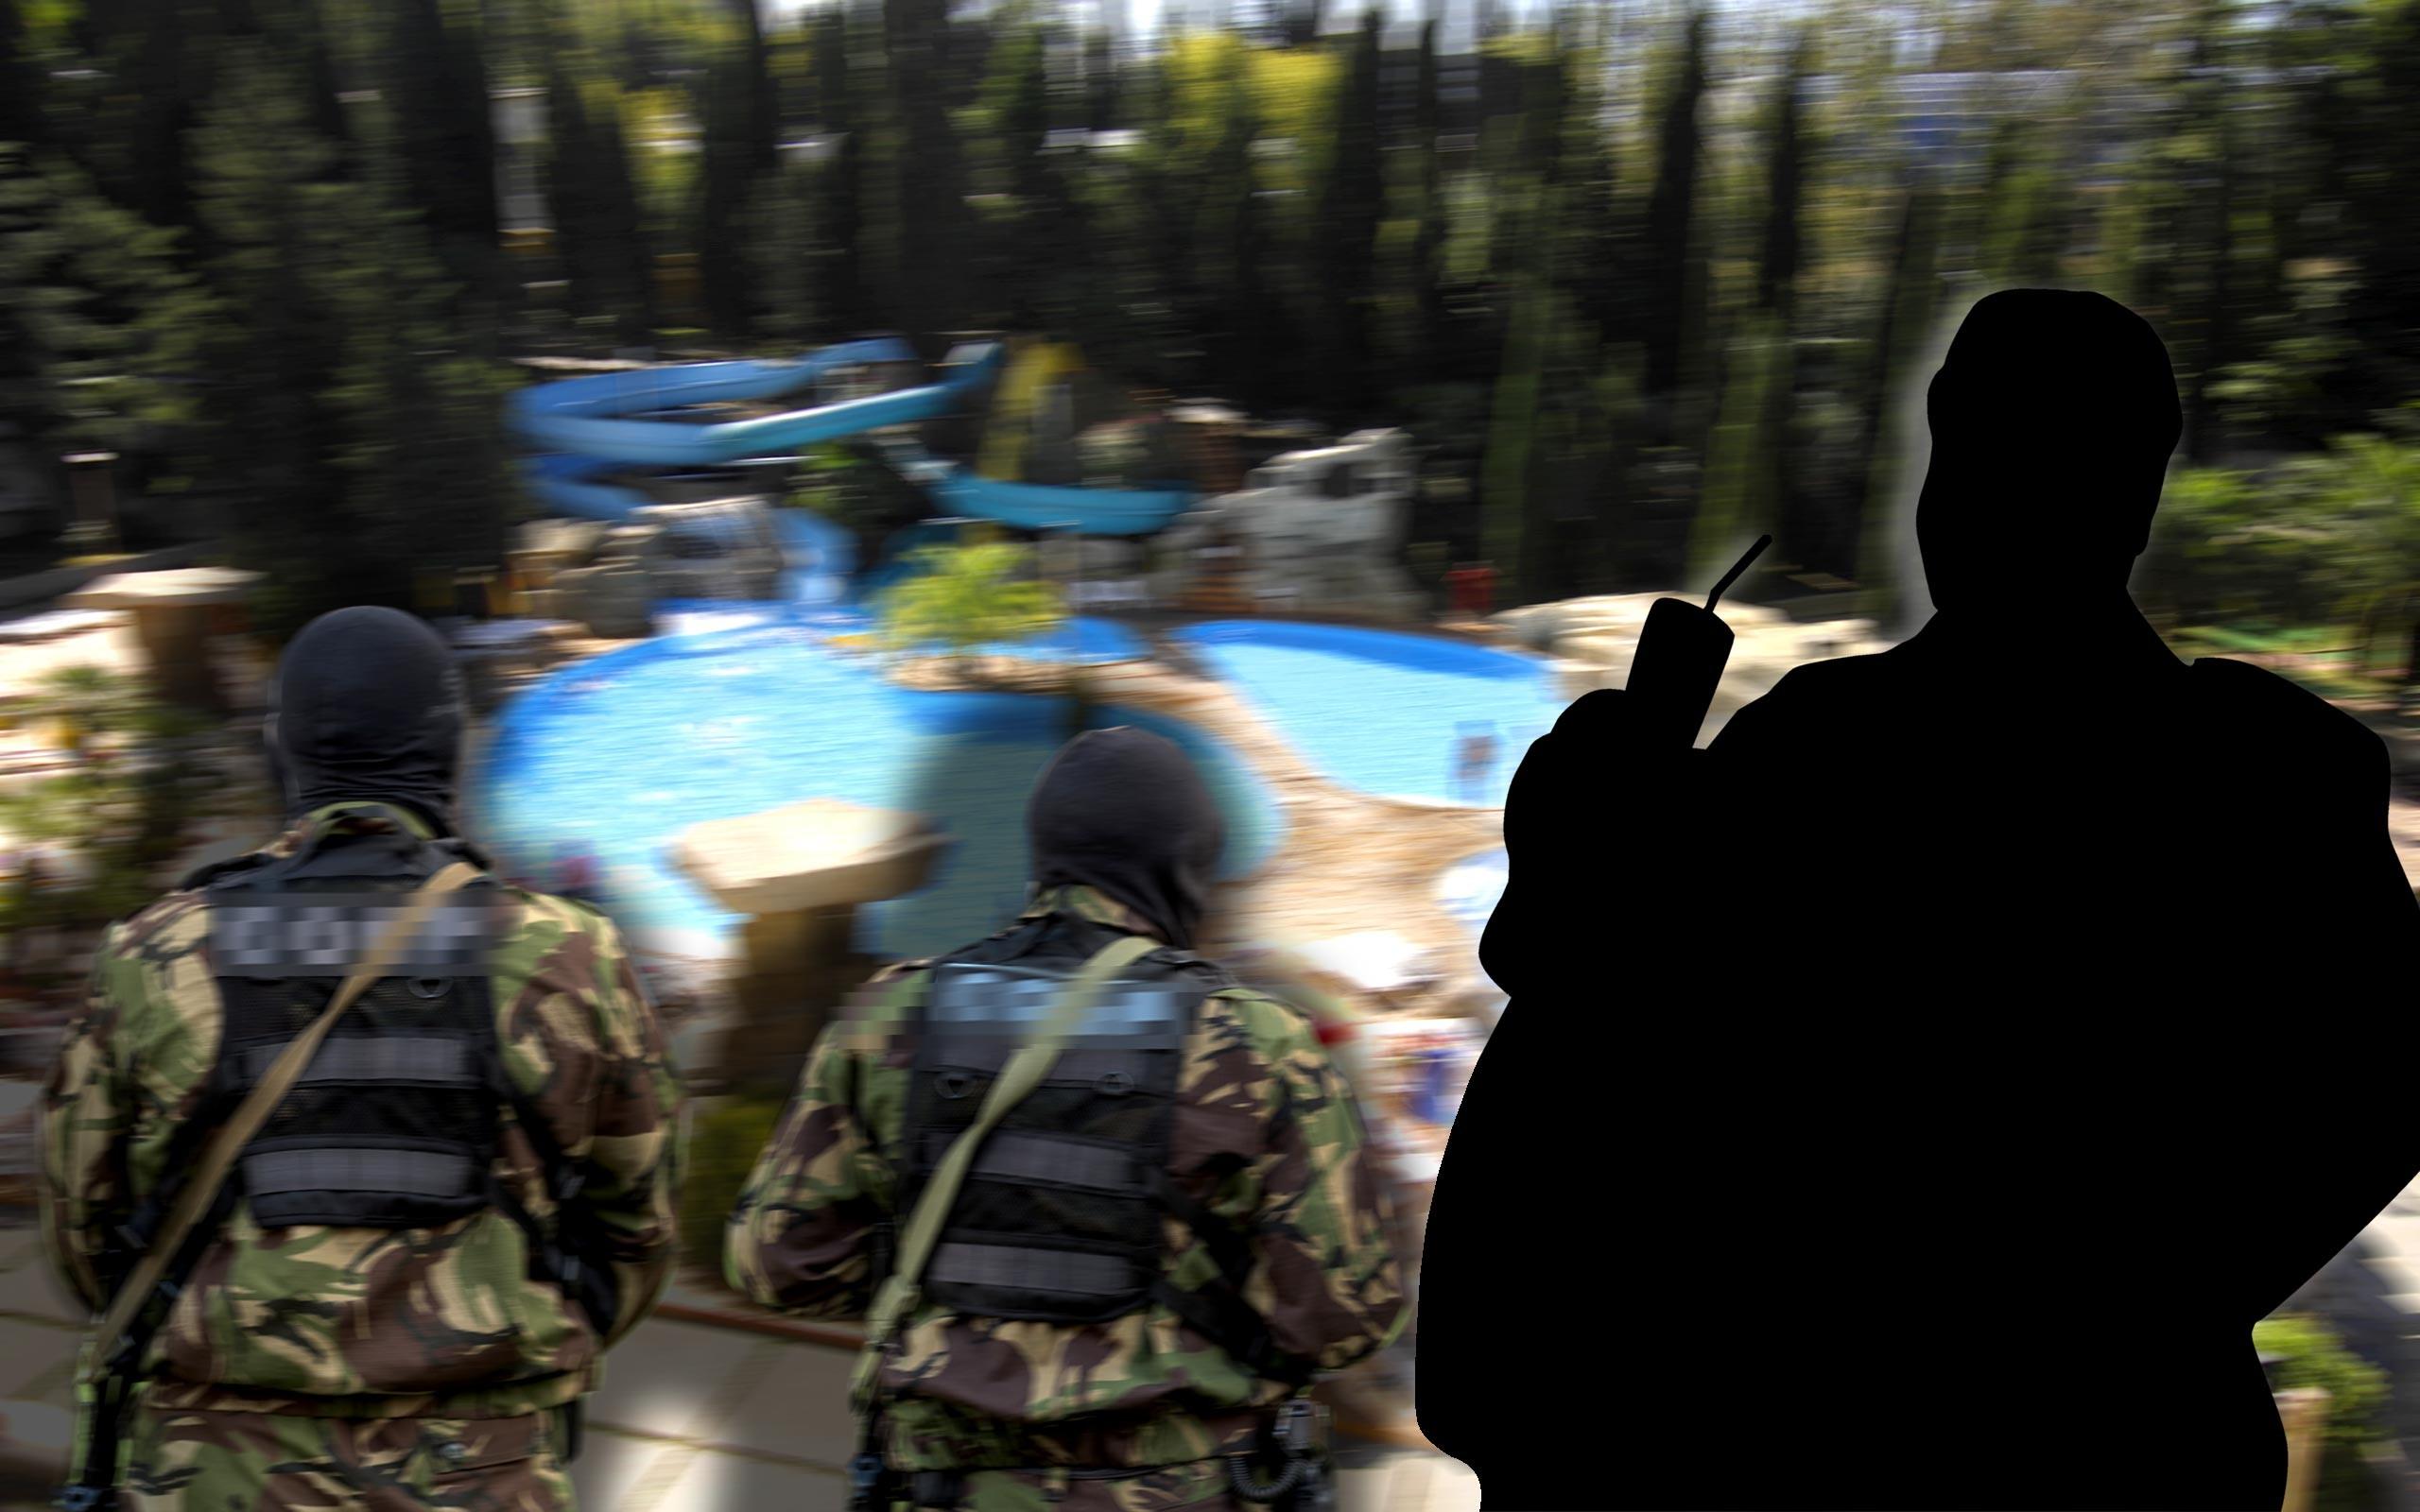 <p>Фото: &copy; РИА Новости/Алексей Даничев/Михаил Мордасов/Валерий Левитин</p>